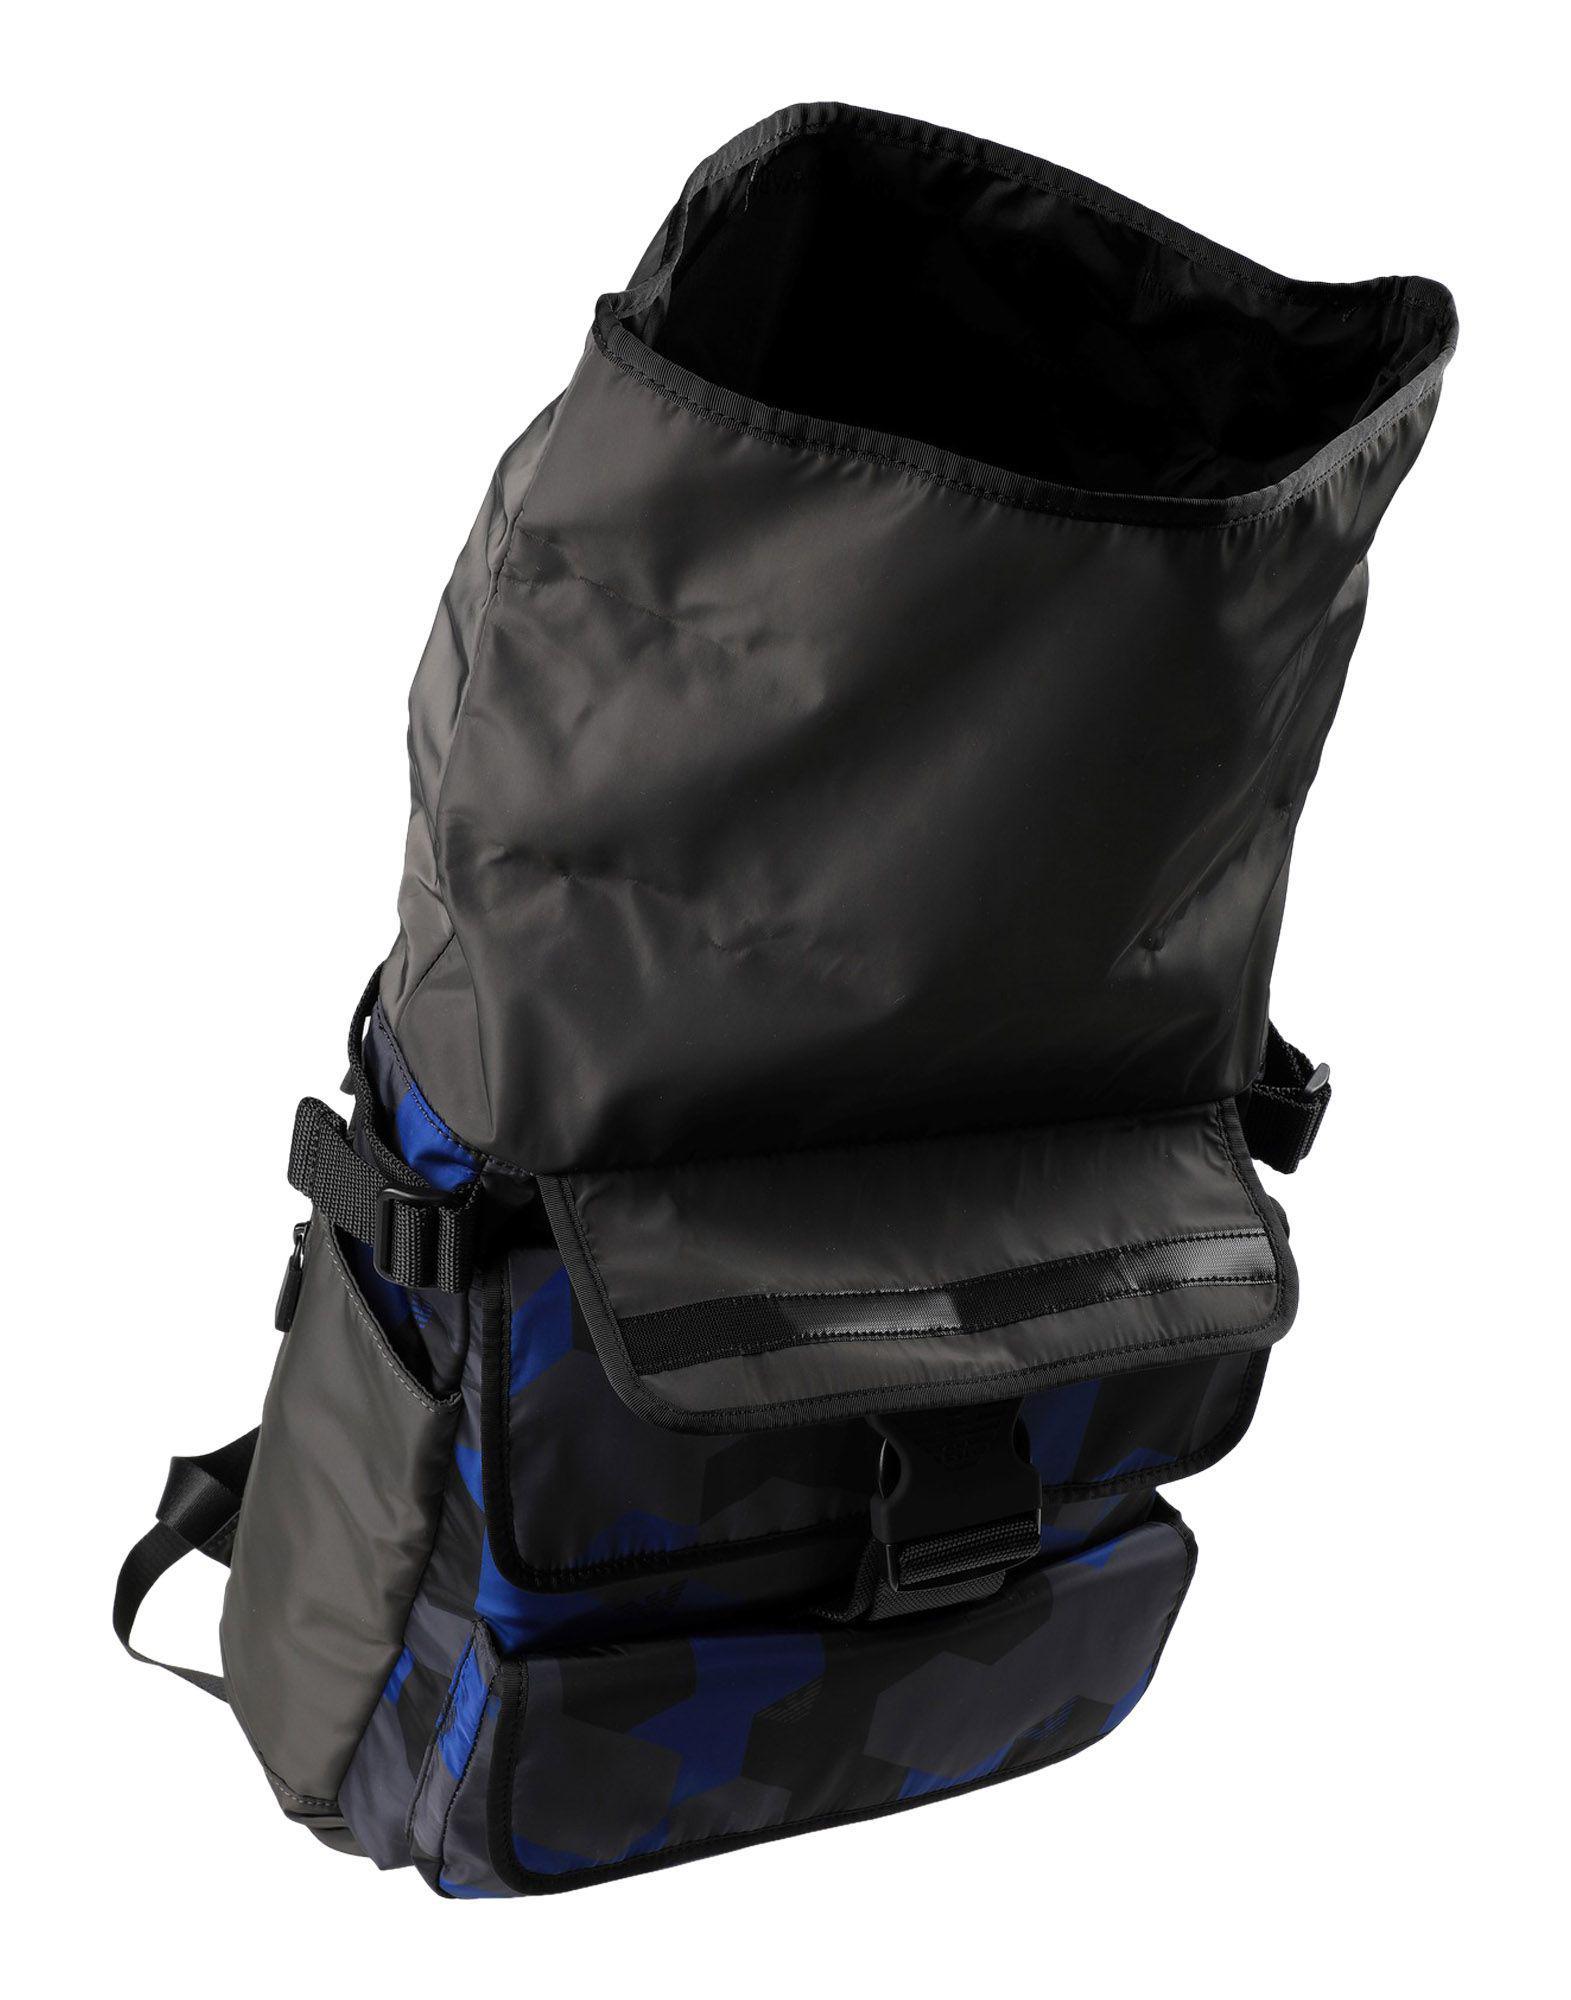 Lyst - Emporio Armani Backpacks   Bum Bags in Black for Men f9df038443872